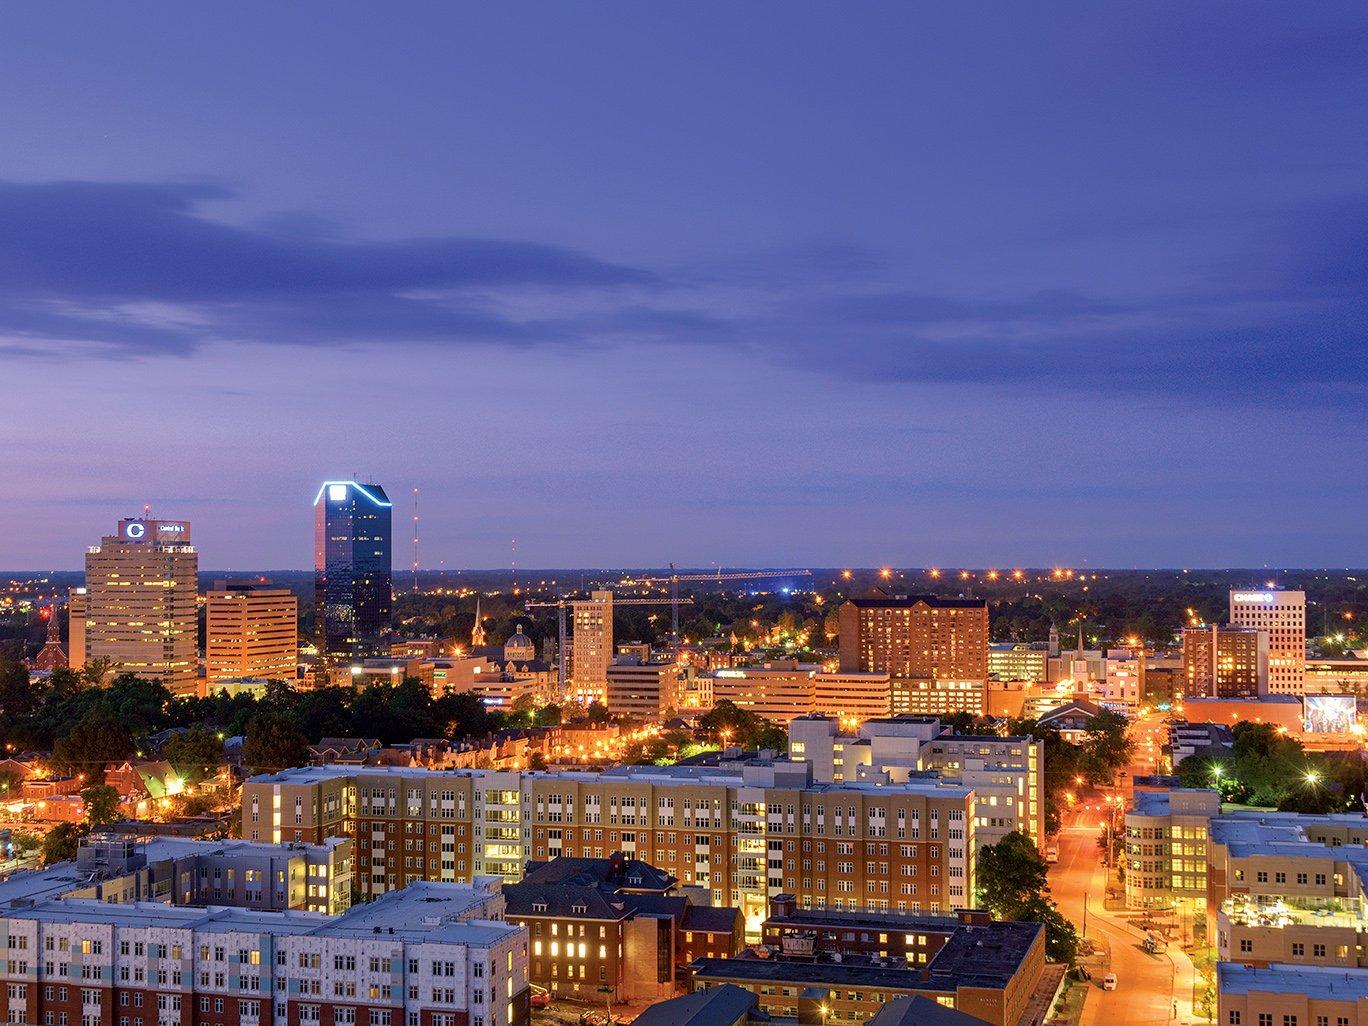 Downtown Lexington Skyline at Night